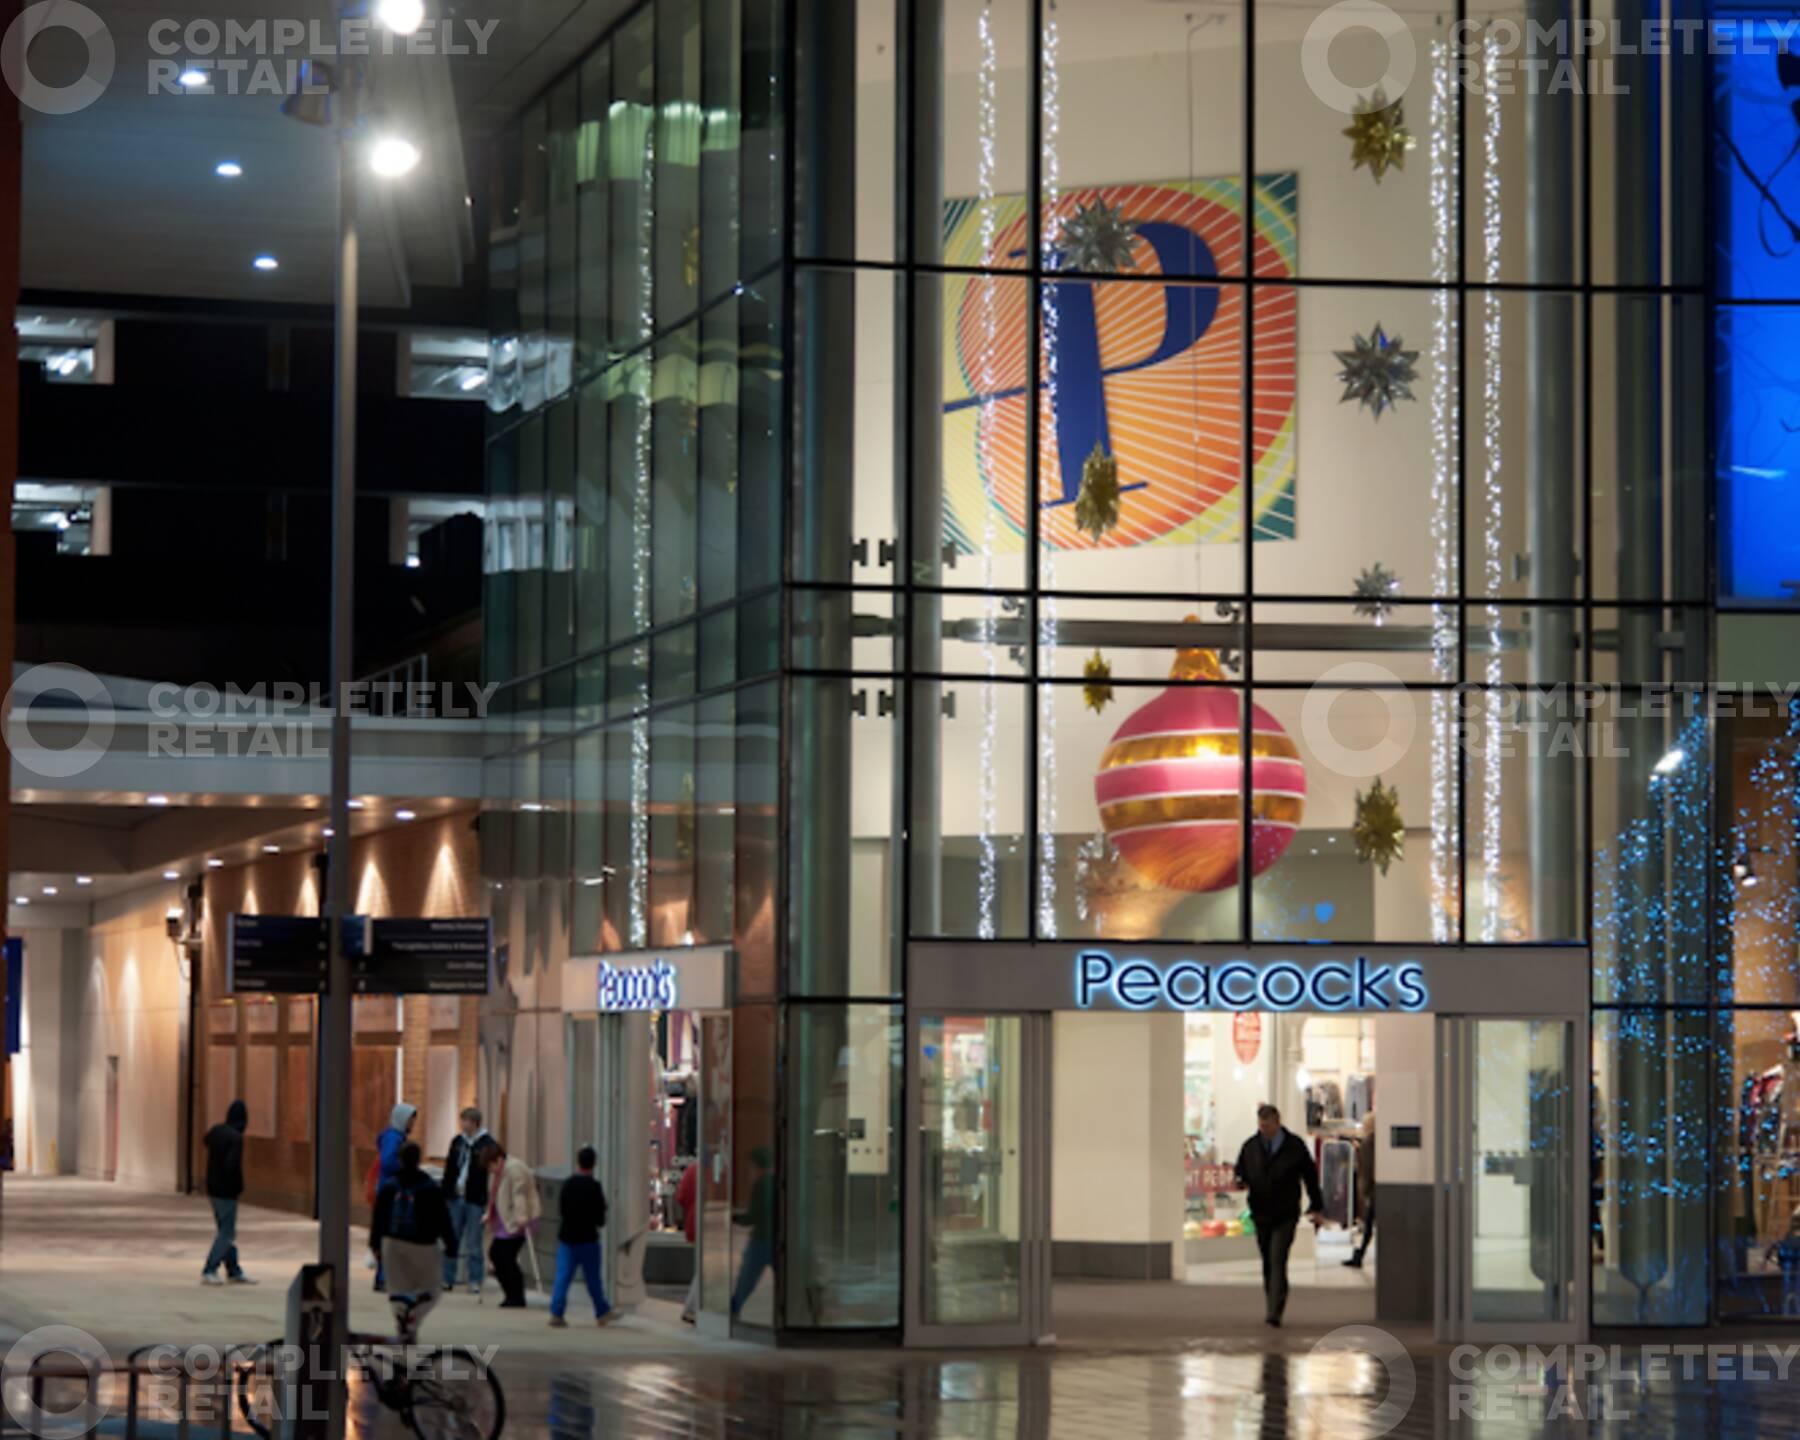 The Peacocks Shopping Centre